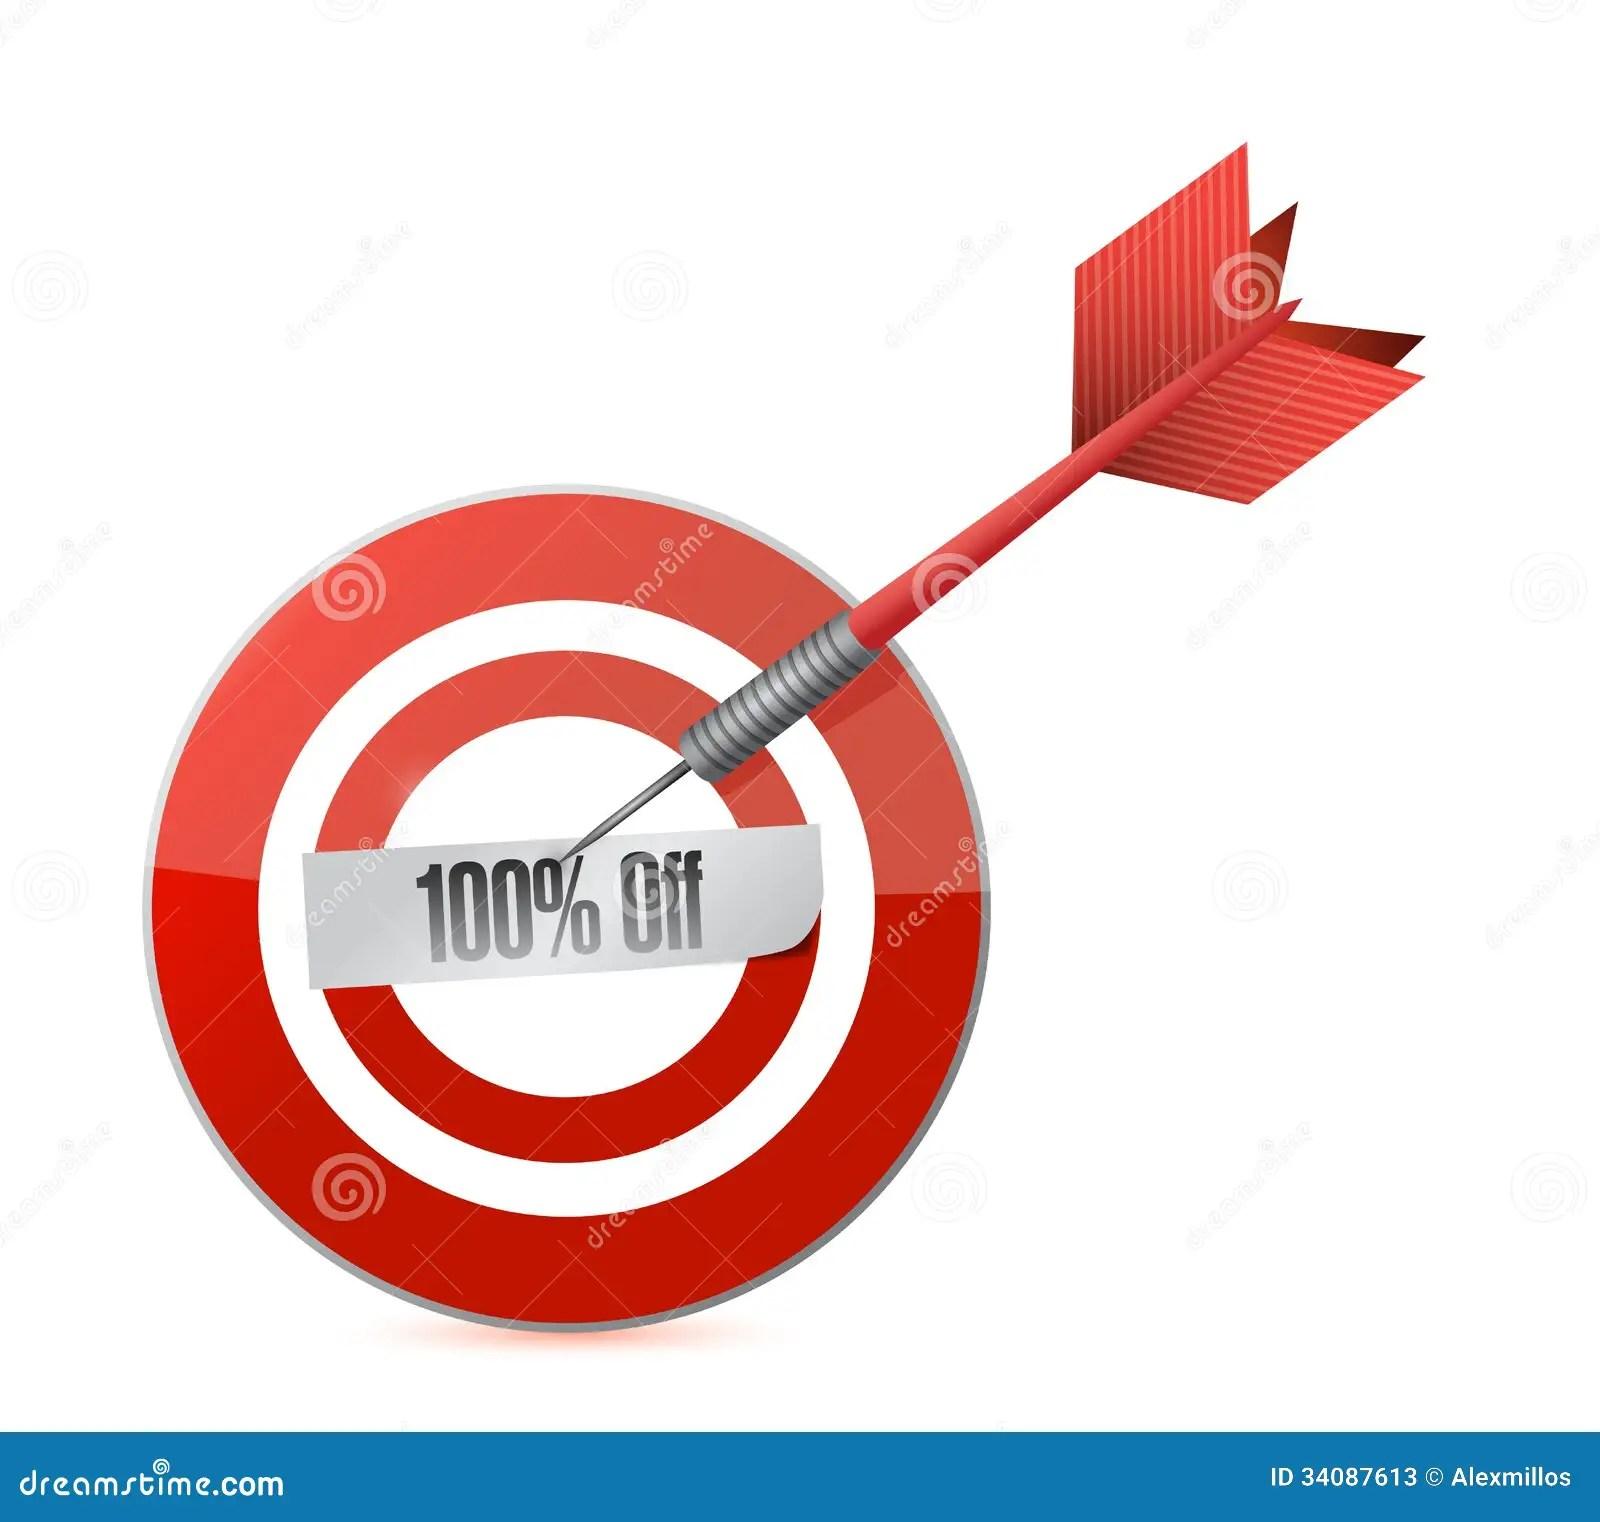 Target 100 Percentage Discount Illustration Stock Photos